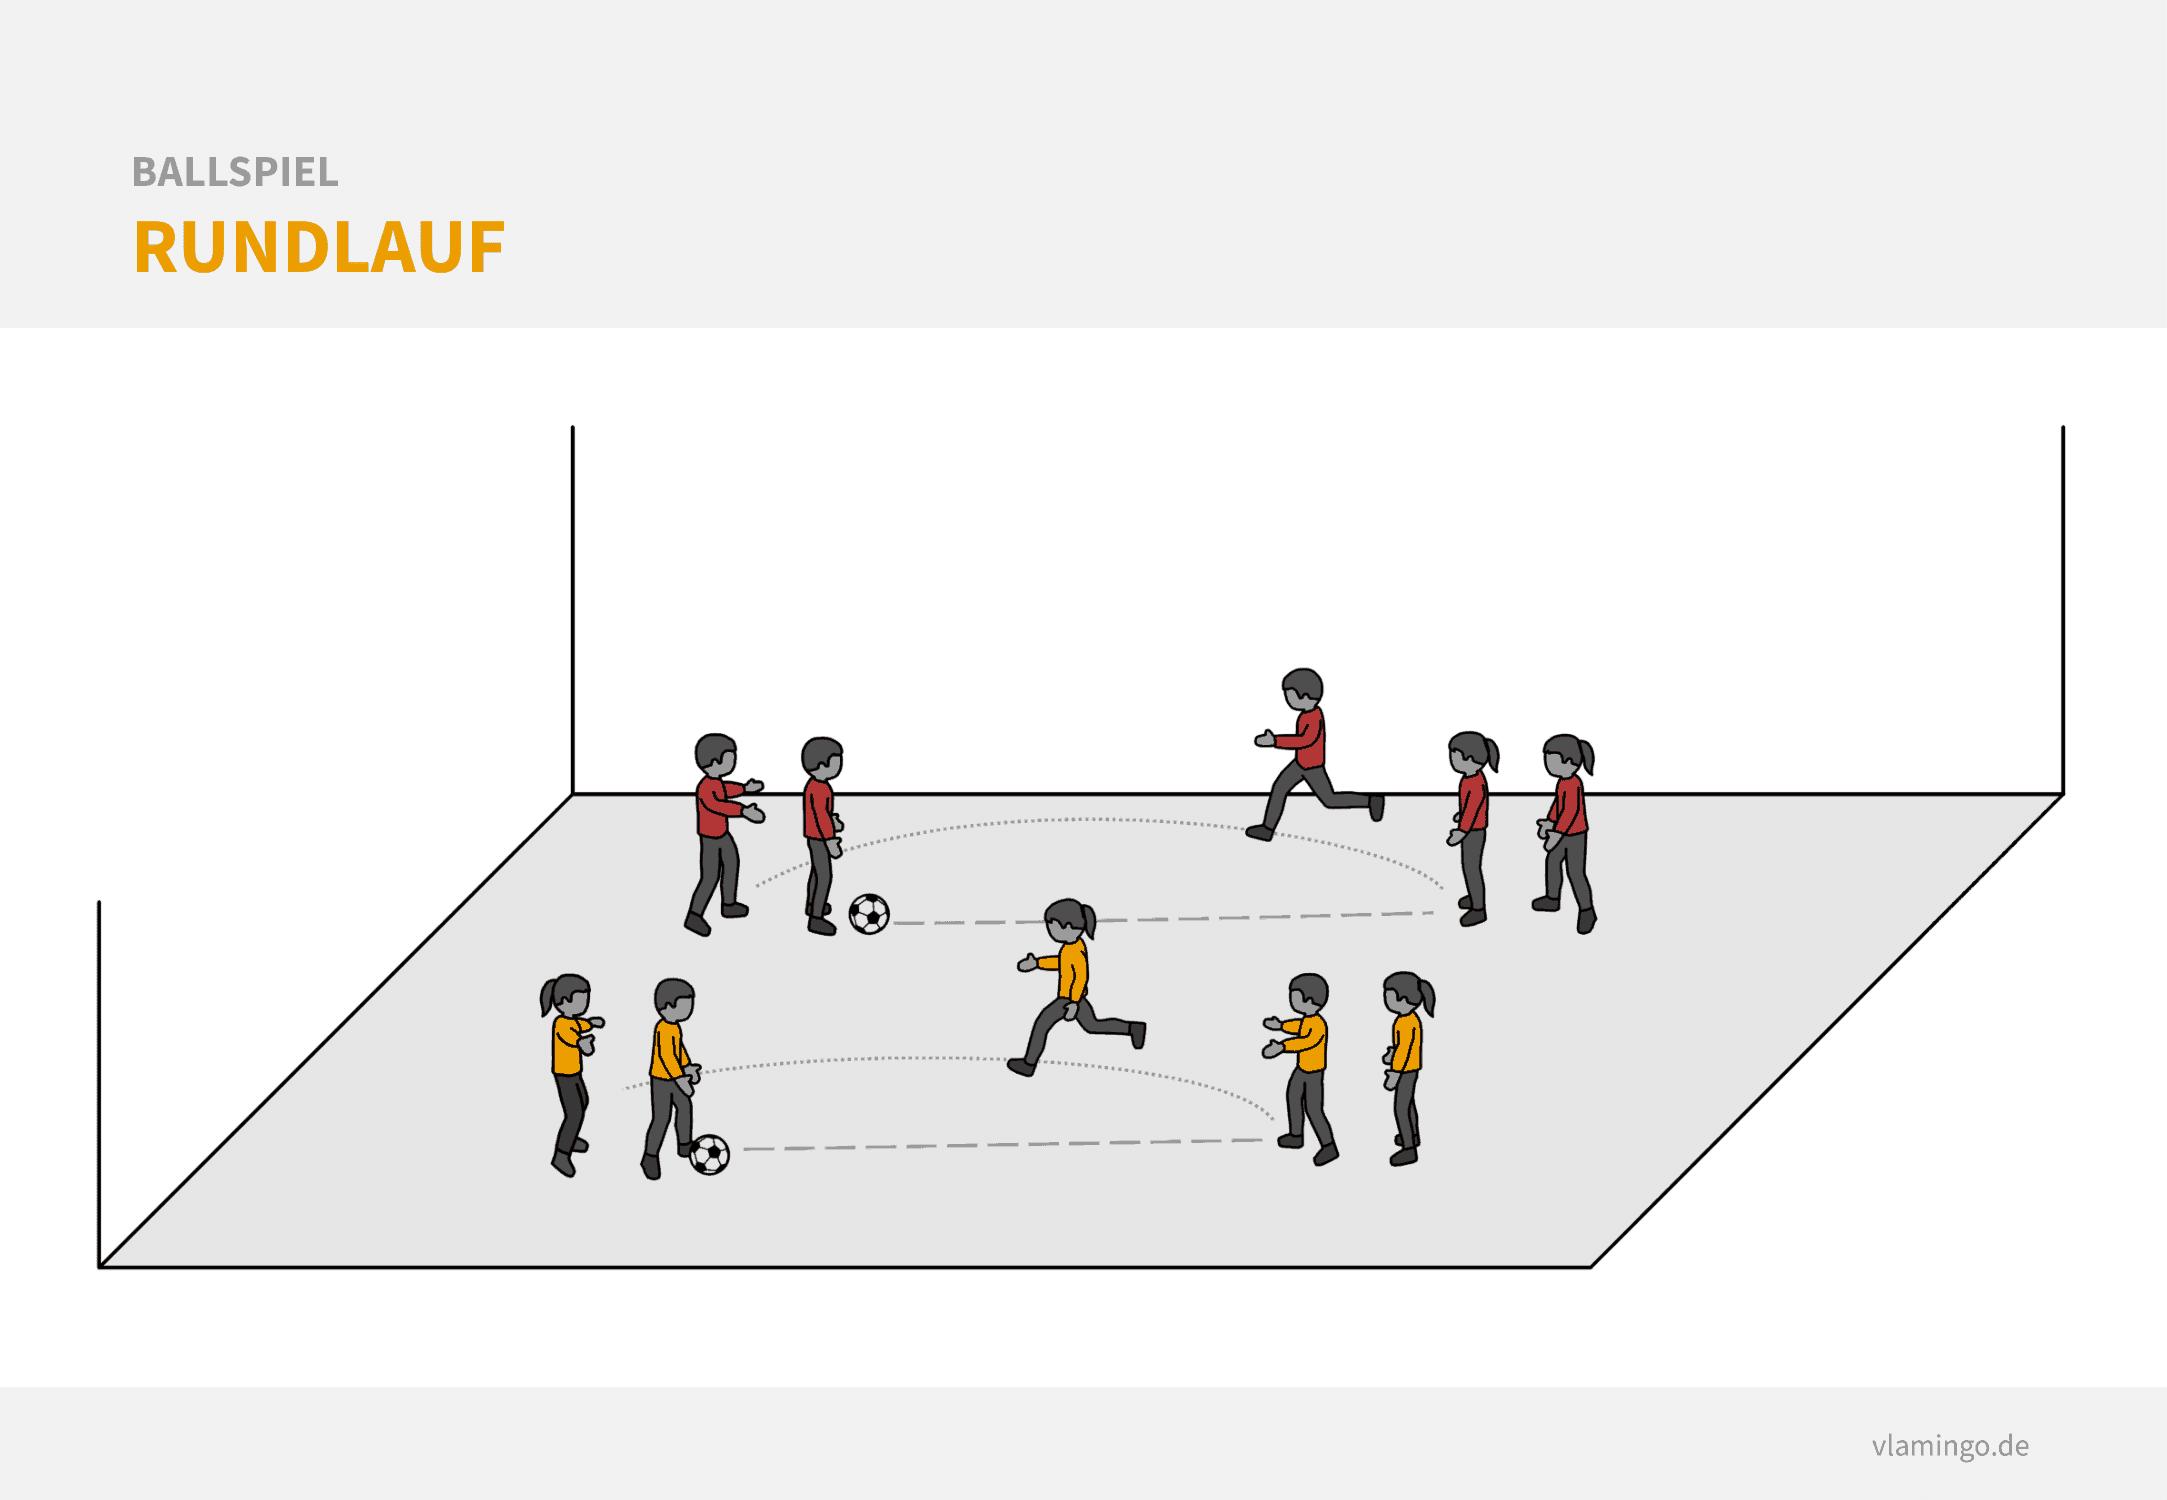 Fußball Aufwärmen: Rundlauf